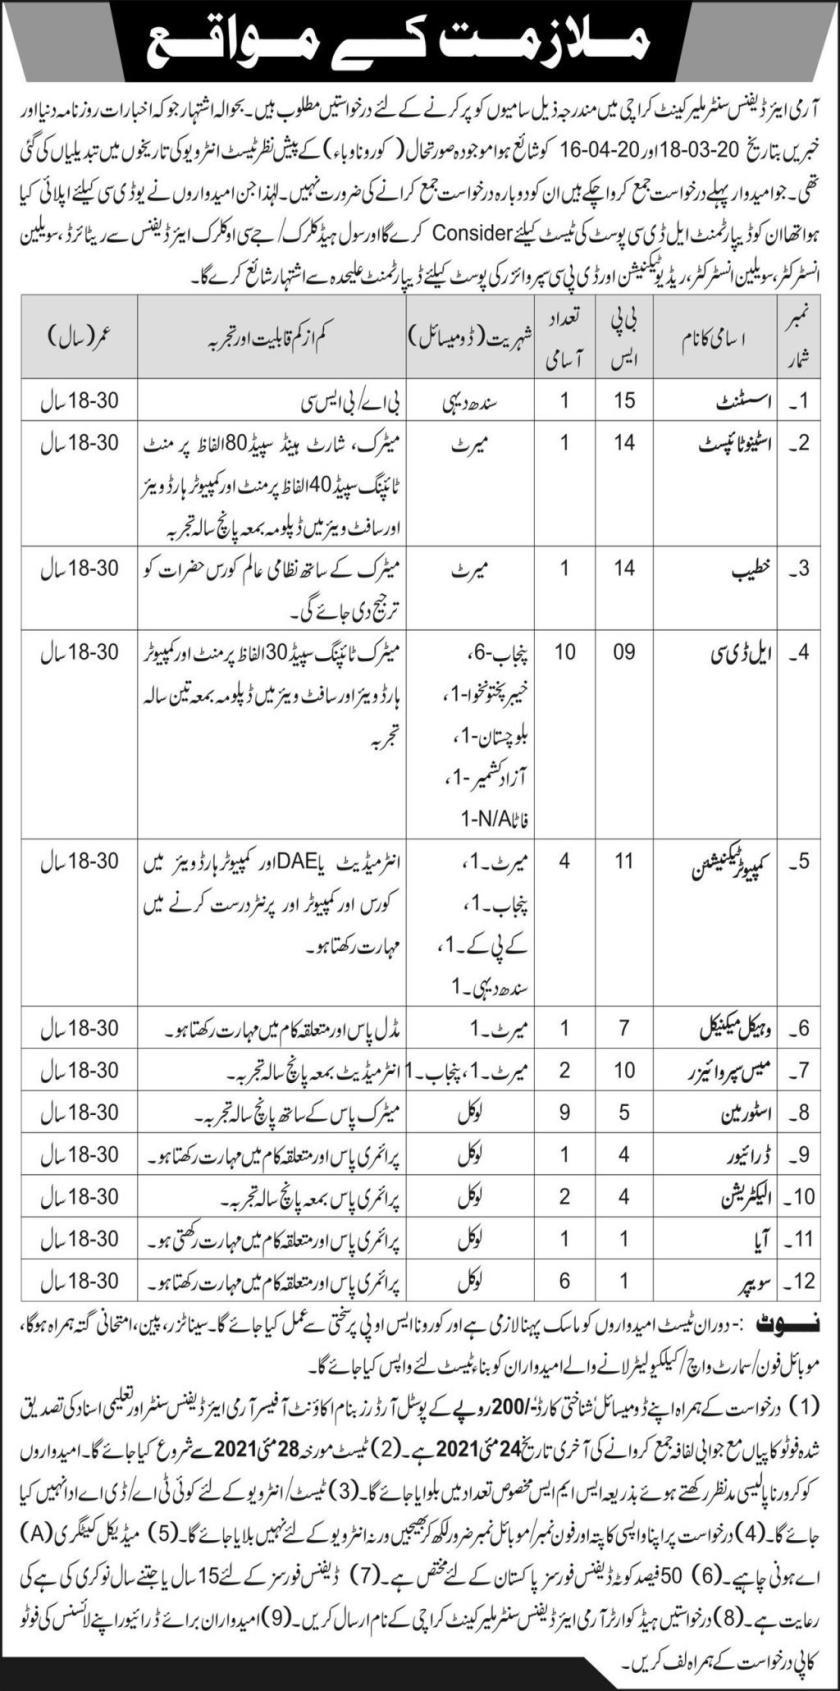 Pakistan Army Air Defence Centre Malir Cantt Jobs 2021